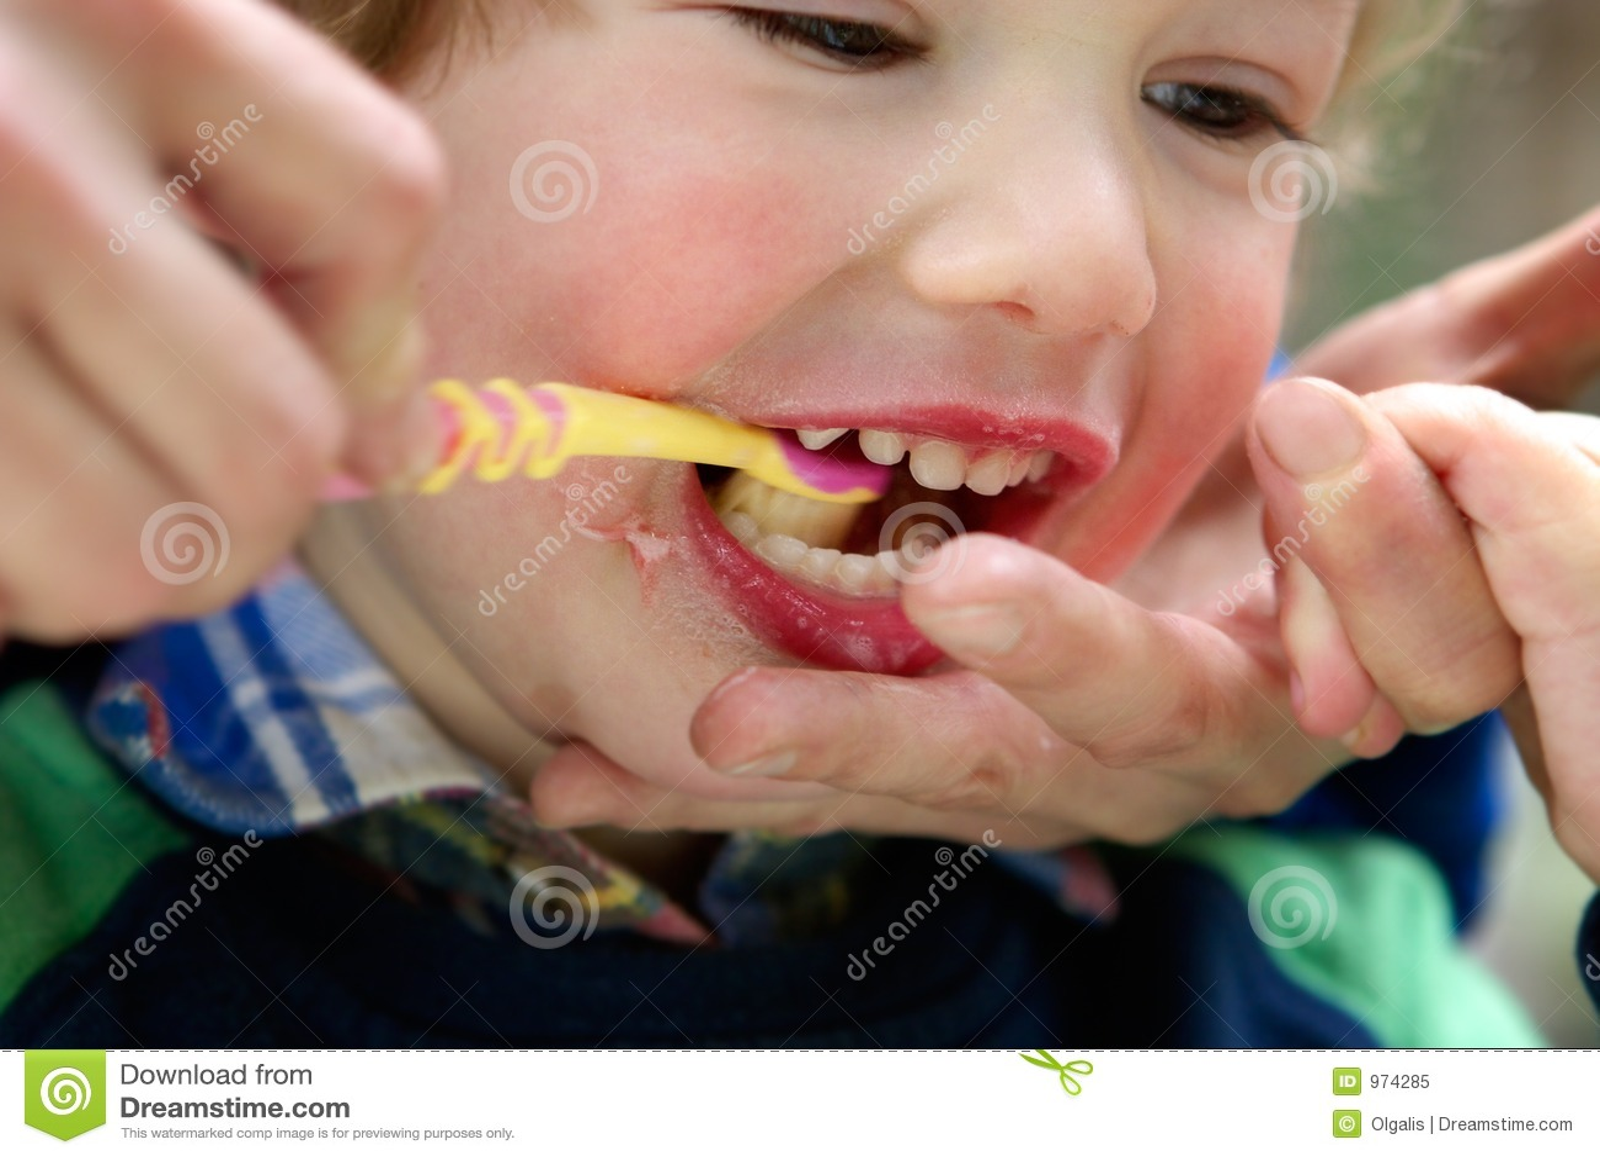 зубы ребенка чистые